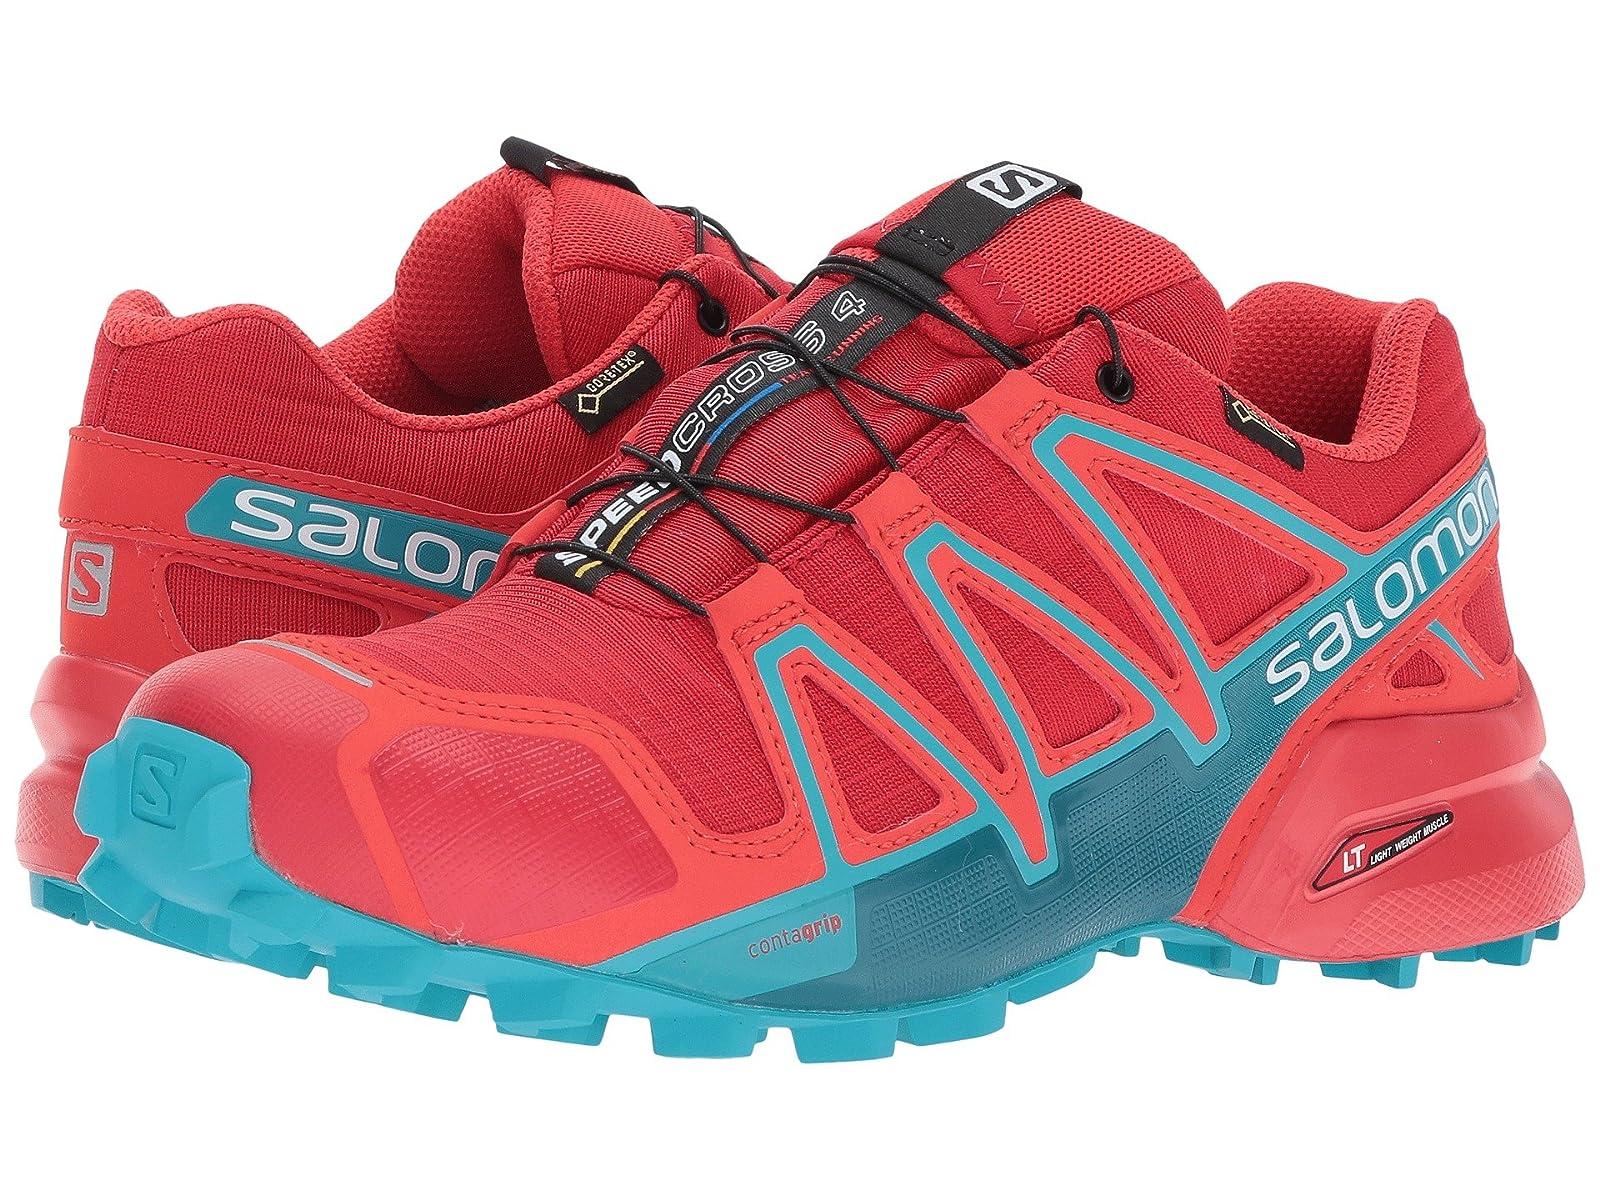 Salomon Speedcross 4 GTXAtmospheric grades have affordable shoes